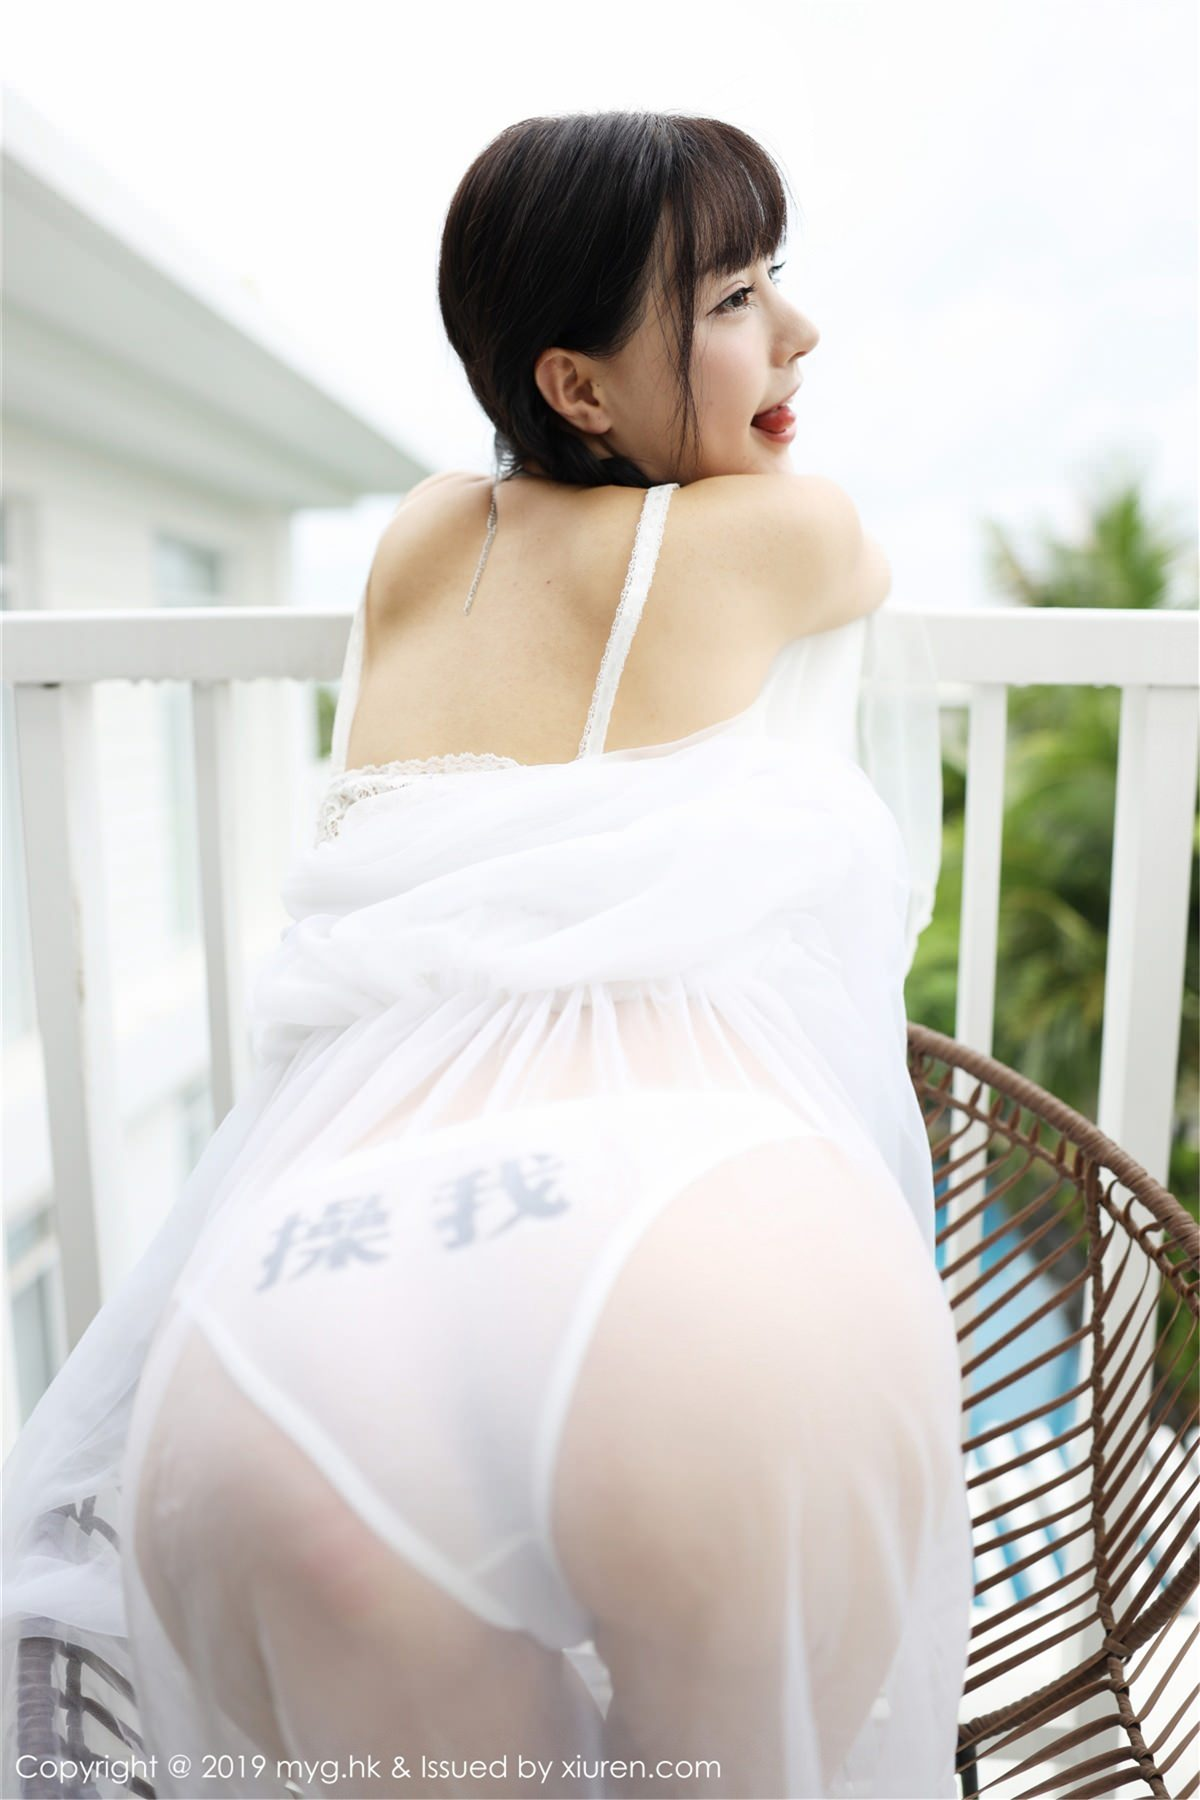 MyGirl Vol.360 1P, mygirl, Zhu Ke Er